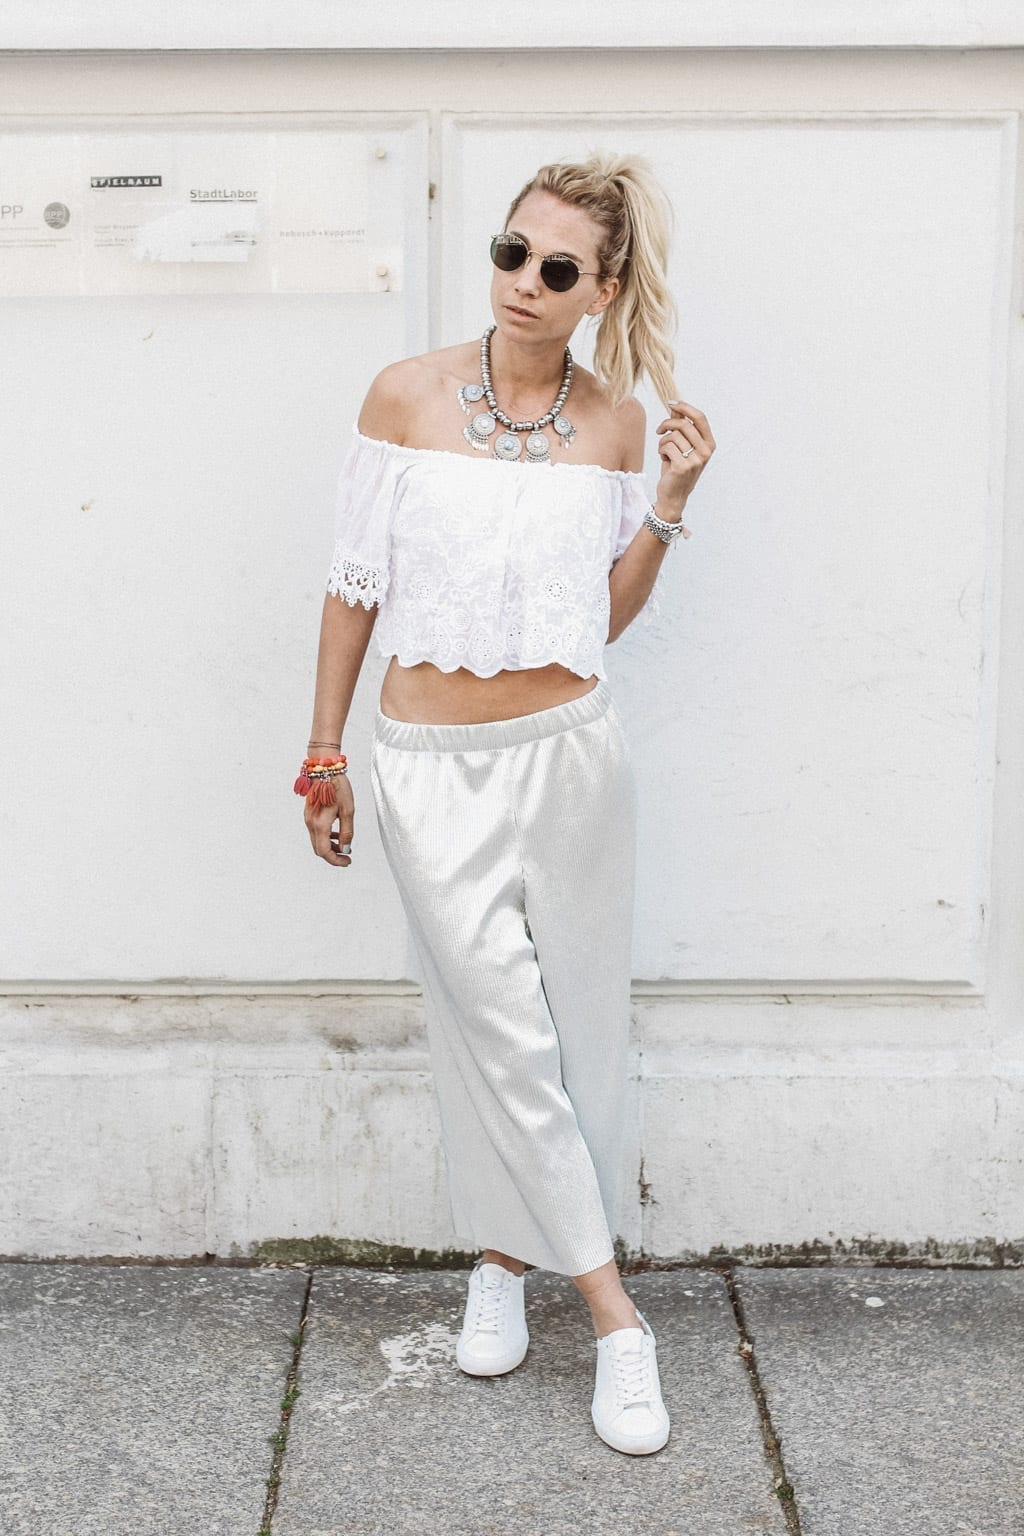 CK160511_Constantly-K-Karin-Kaswurm-Model-Spring-Street-Style-Fashion-Summer-Culotter-Silver-6990